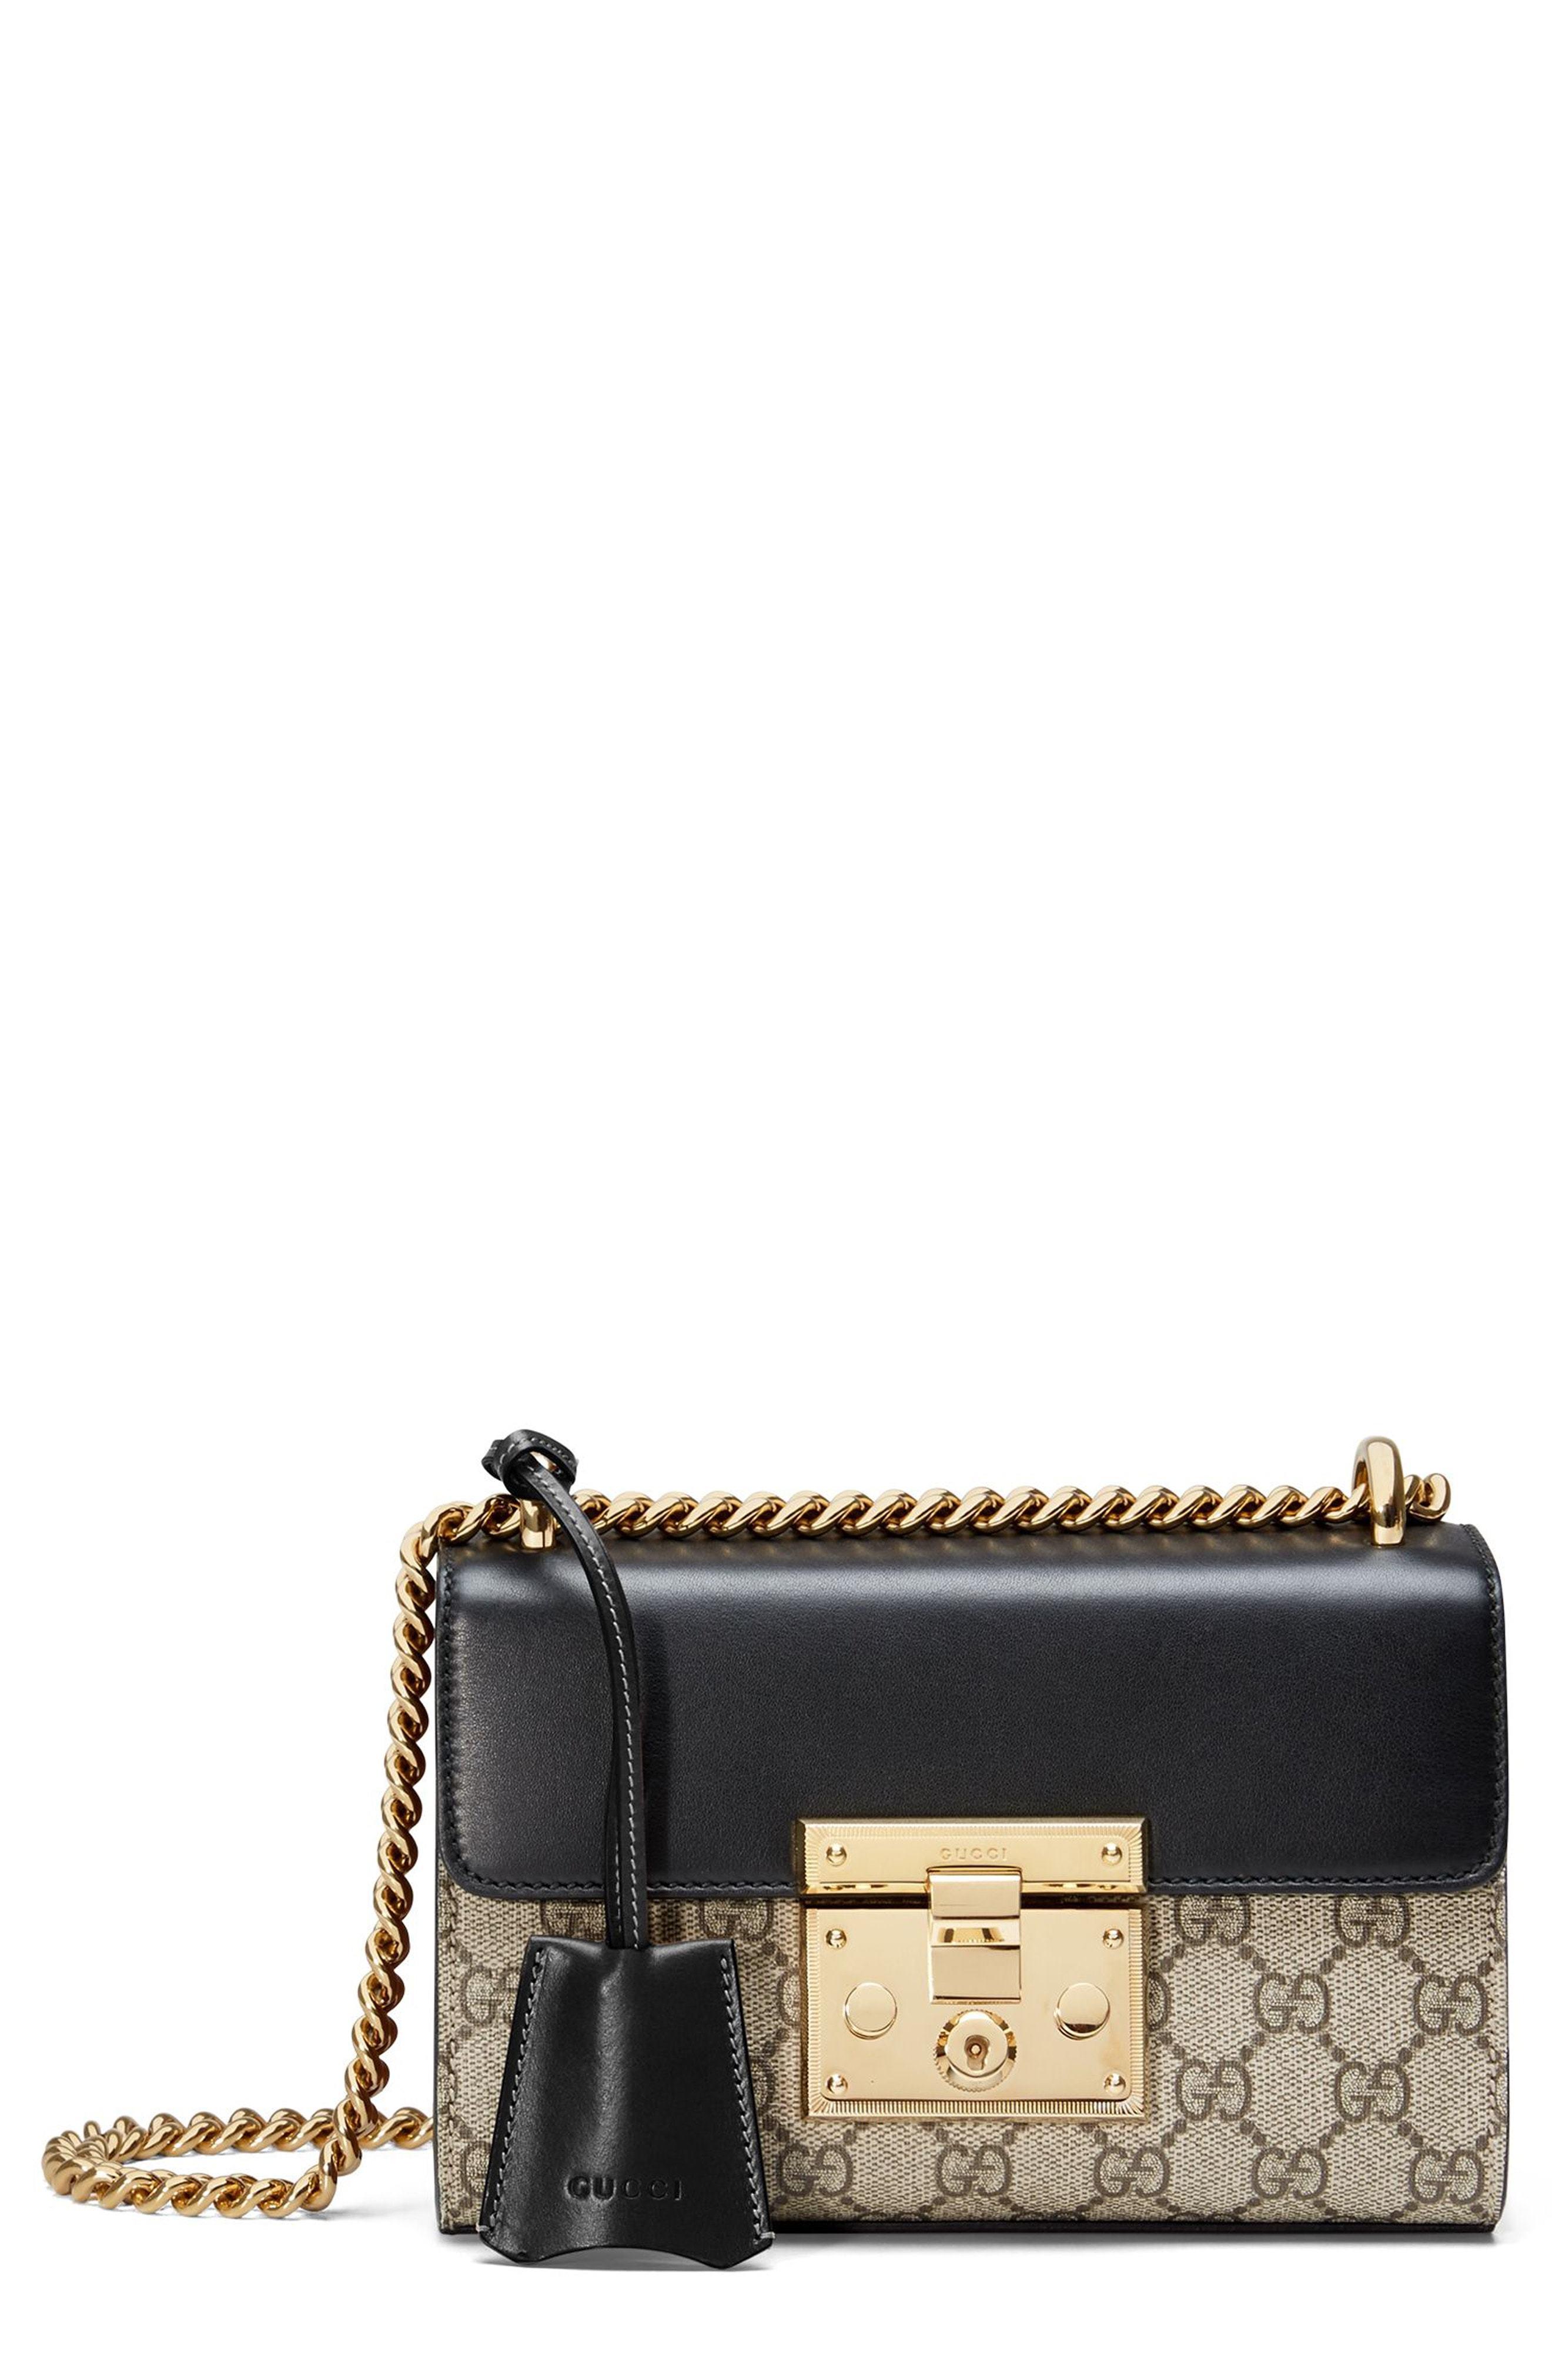 174176221189 Gucci Small Padlock Gg Supreme Canvas Leather Shoulder Bag, $1,750 ...